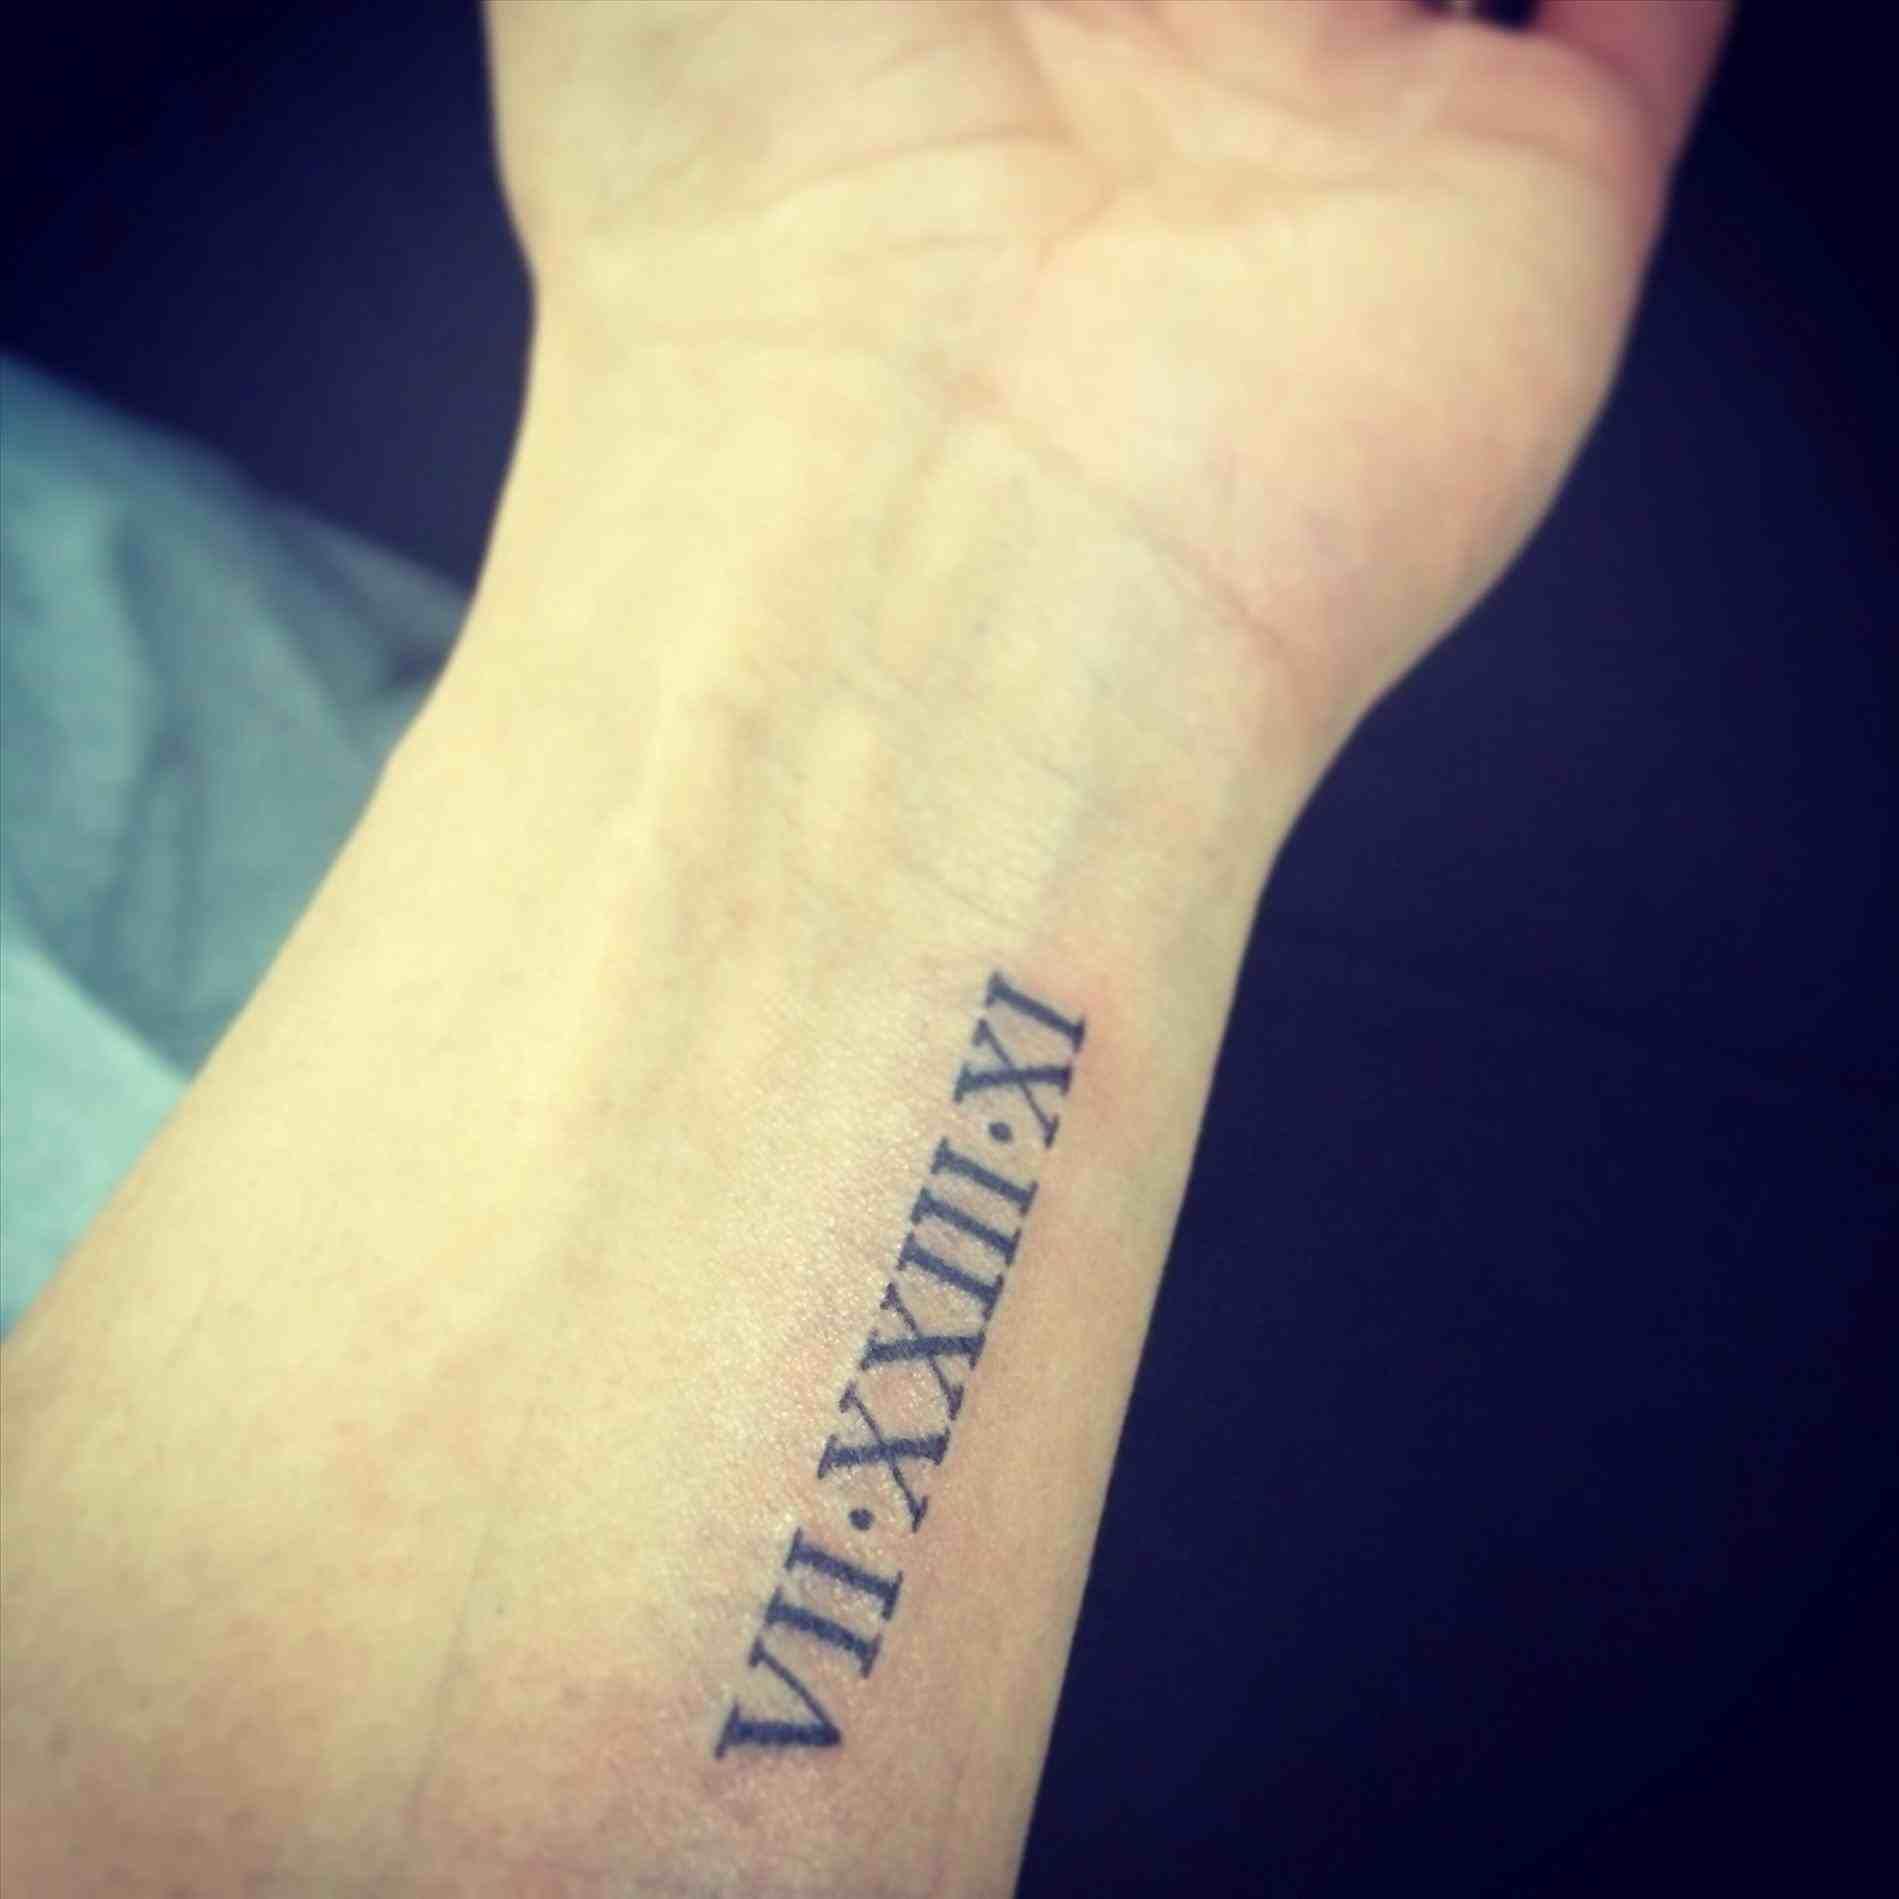 Tattoo Wedding Dates Weddings Roman Numeral Tattoos Forearm